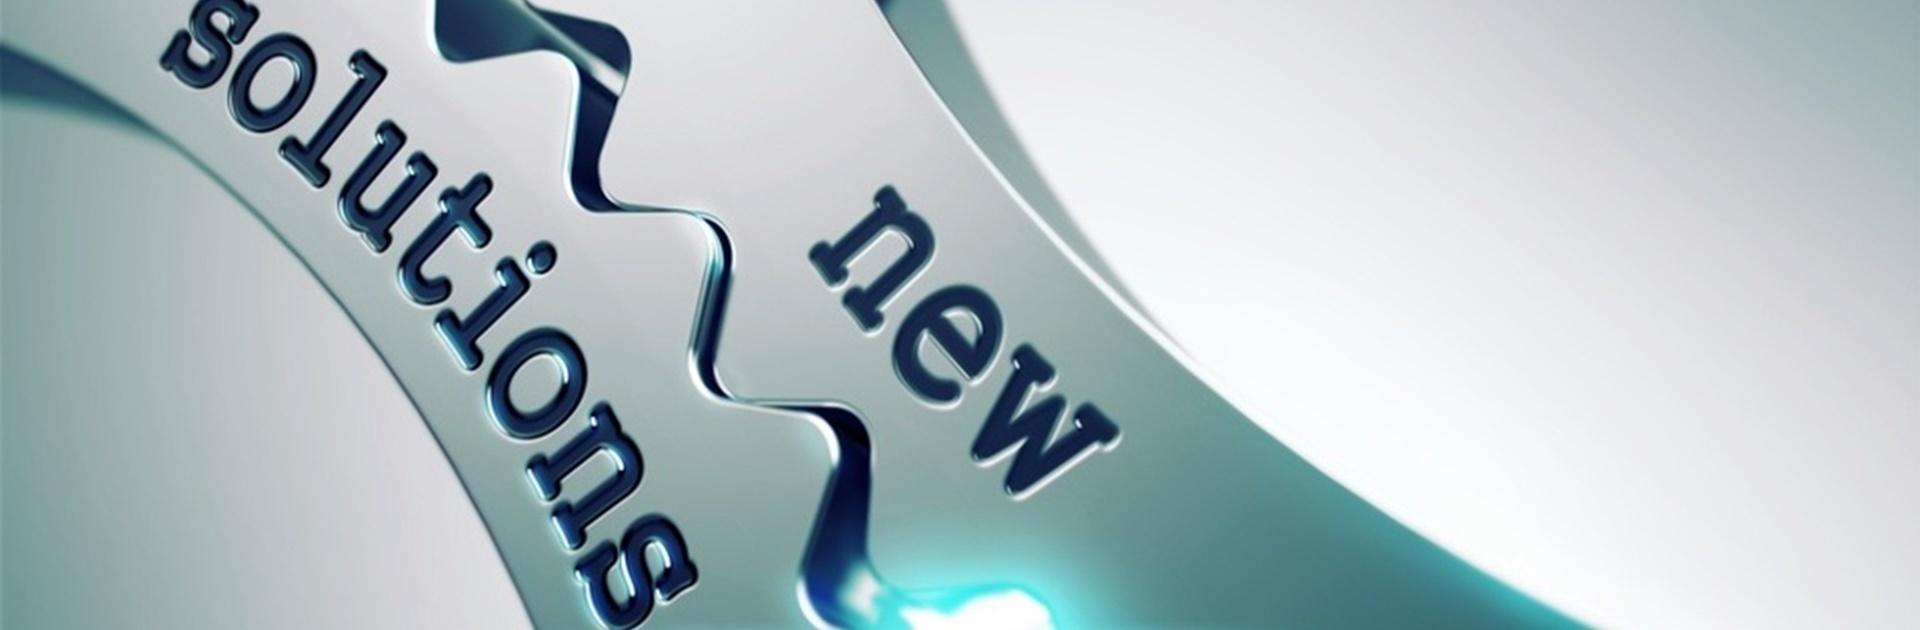 New Solutions on the Mechanism of Metal Cogwheels_1920 630.jpeg